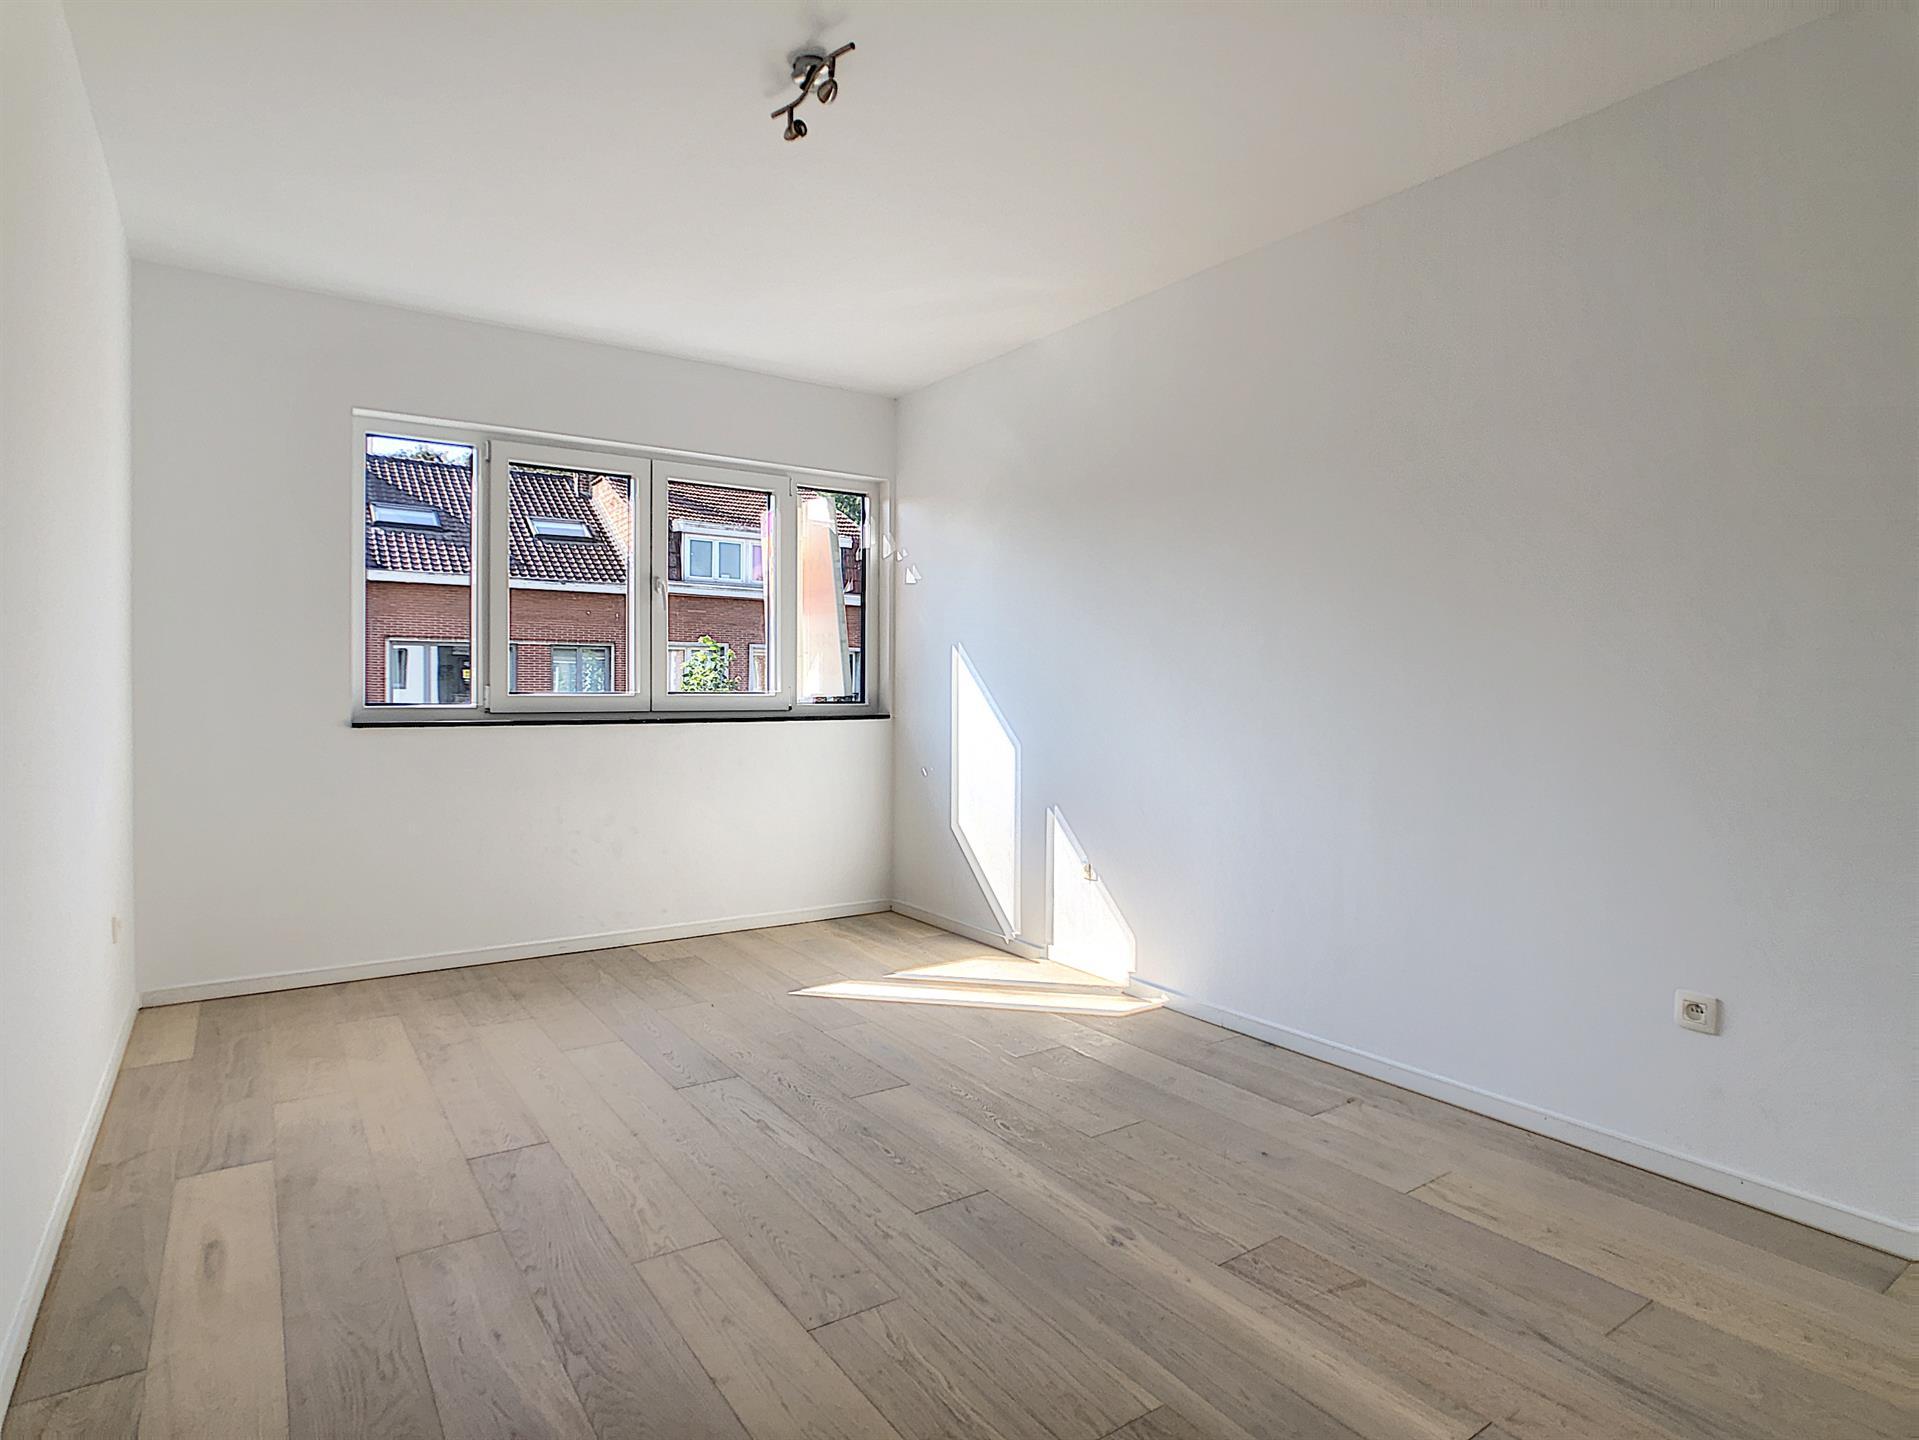 Appartement - Anderlecht - #4252377-36